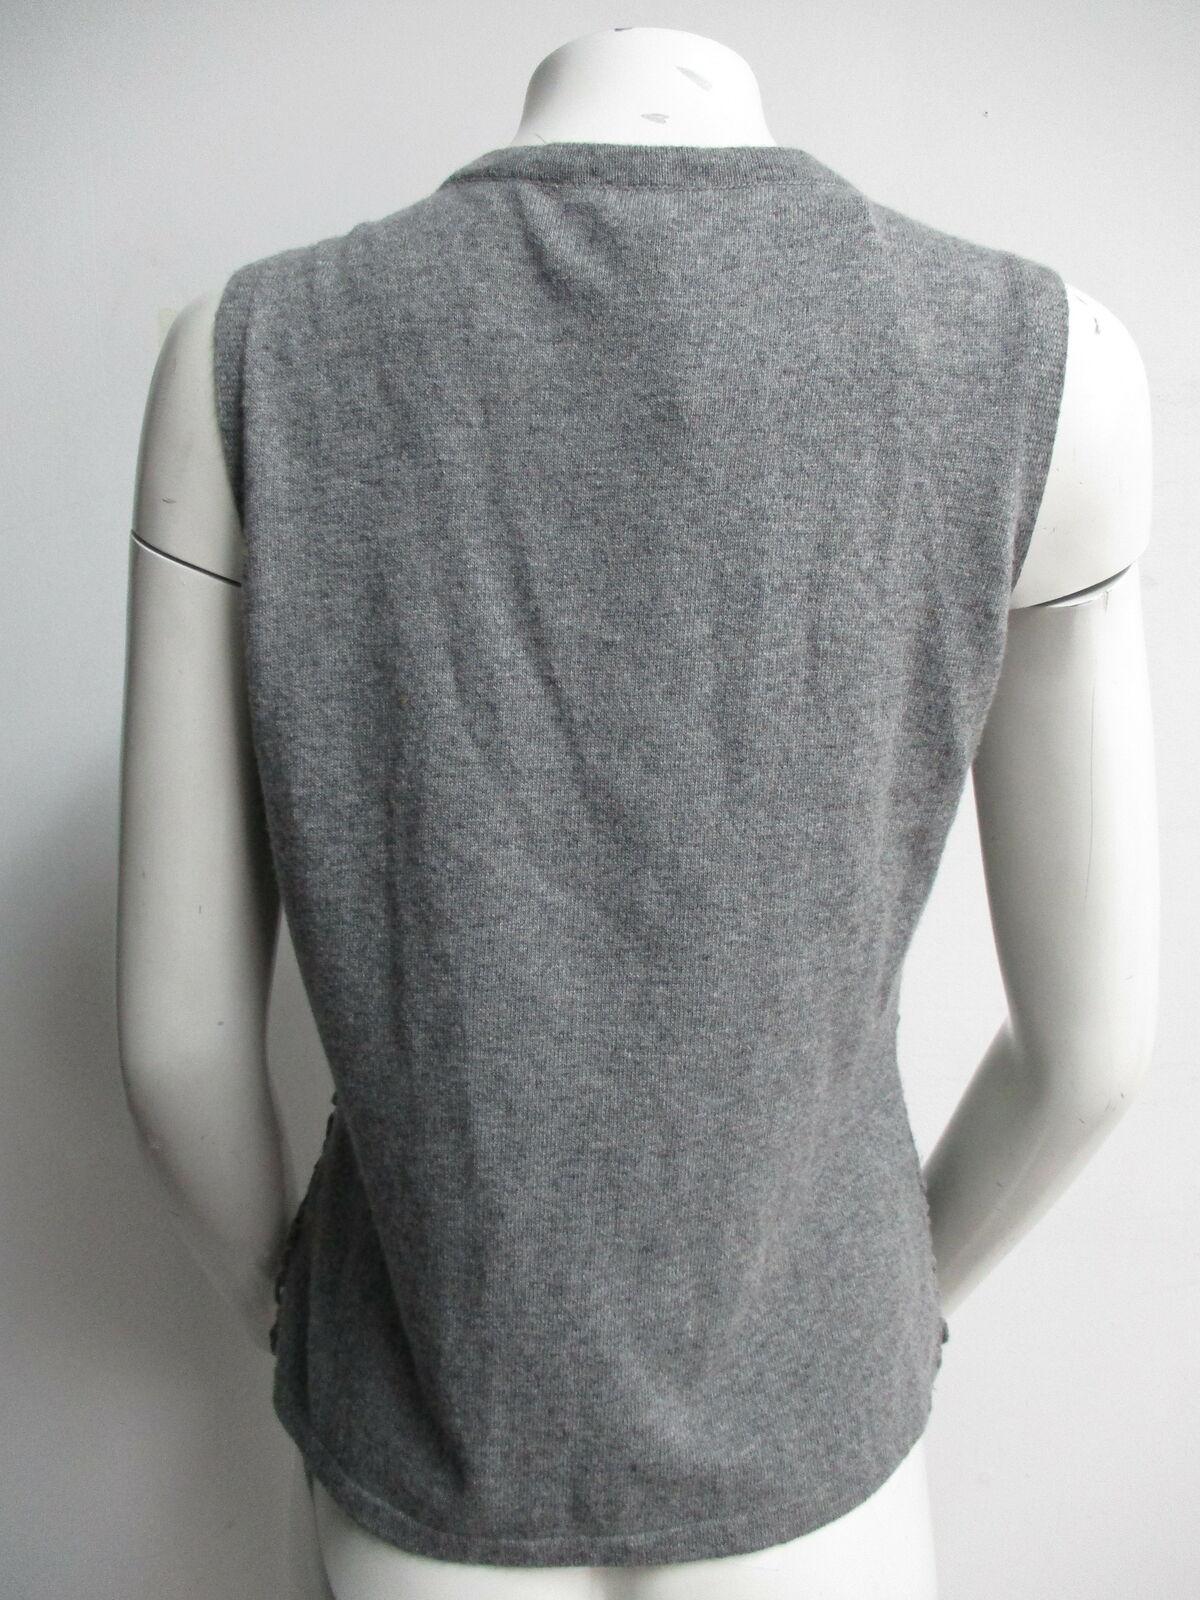 ESCADA grey crochet sweater vest sz L - image 3